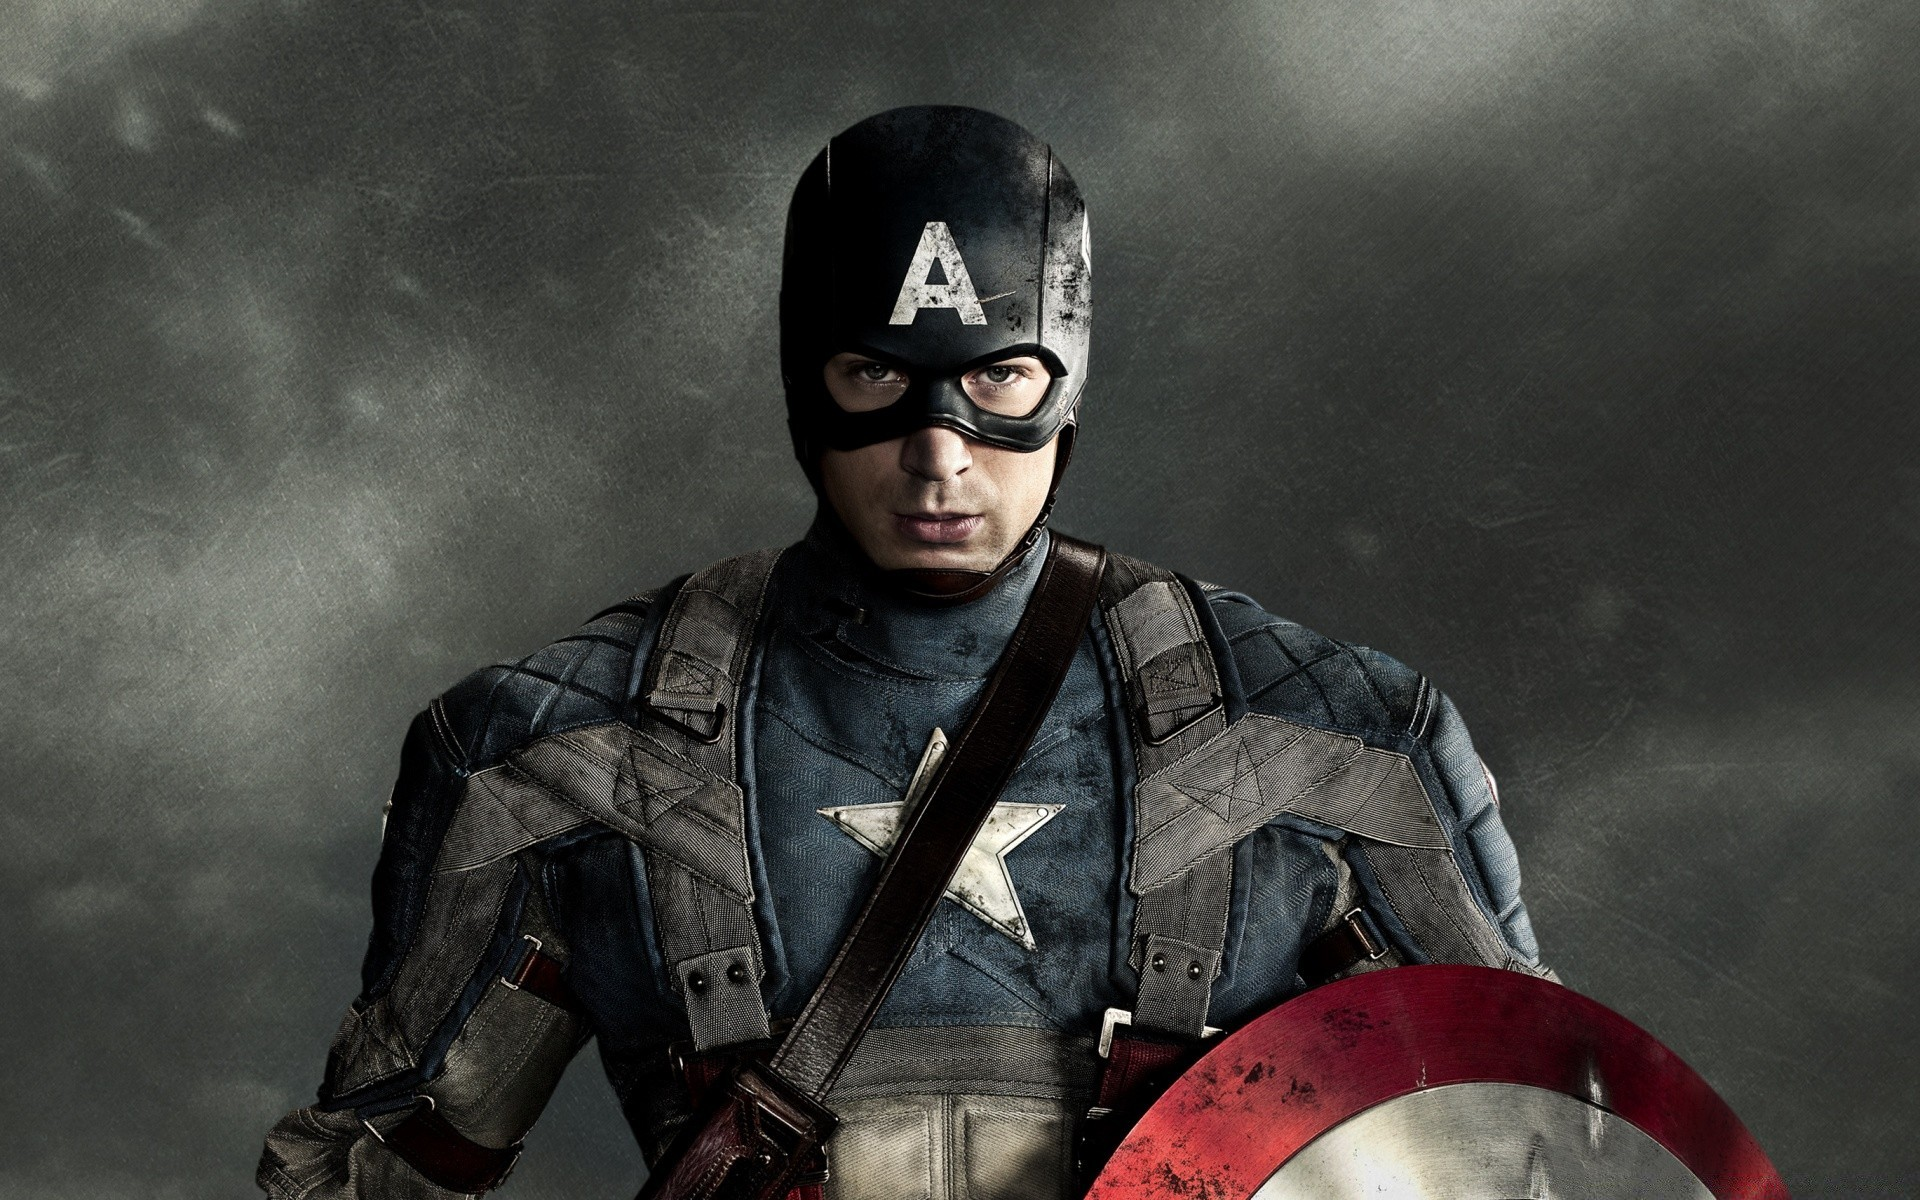 Captain America - Phone wallpapers